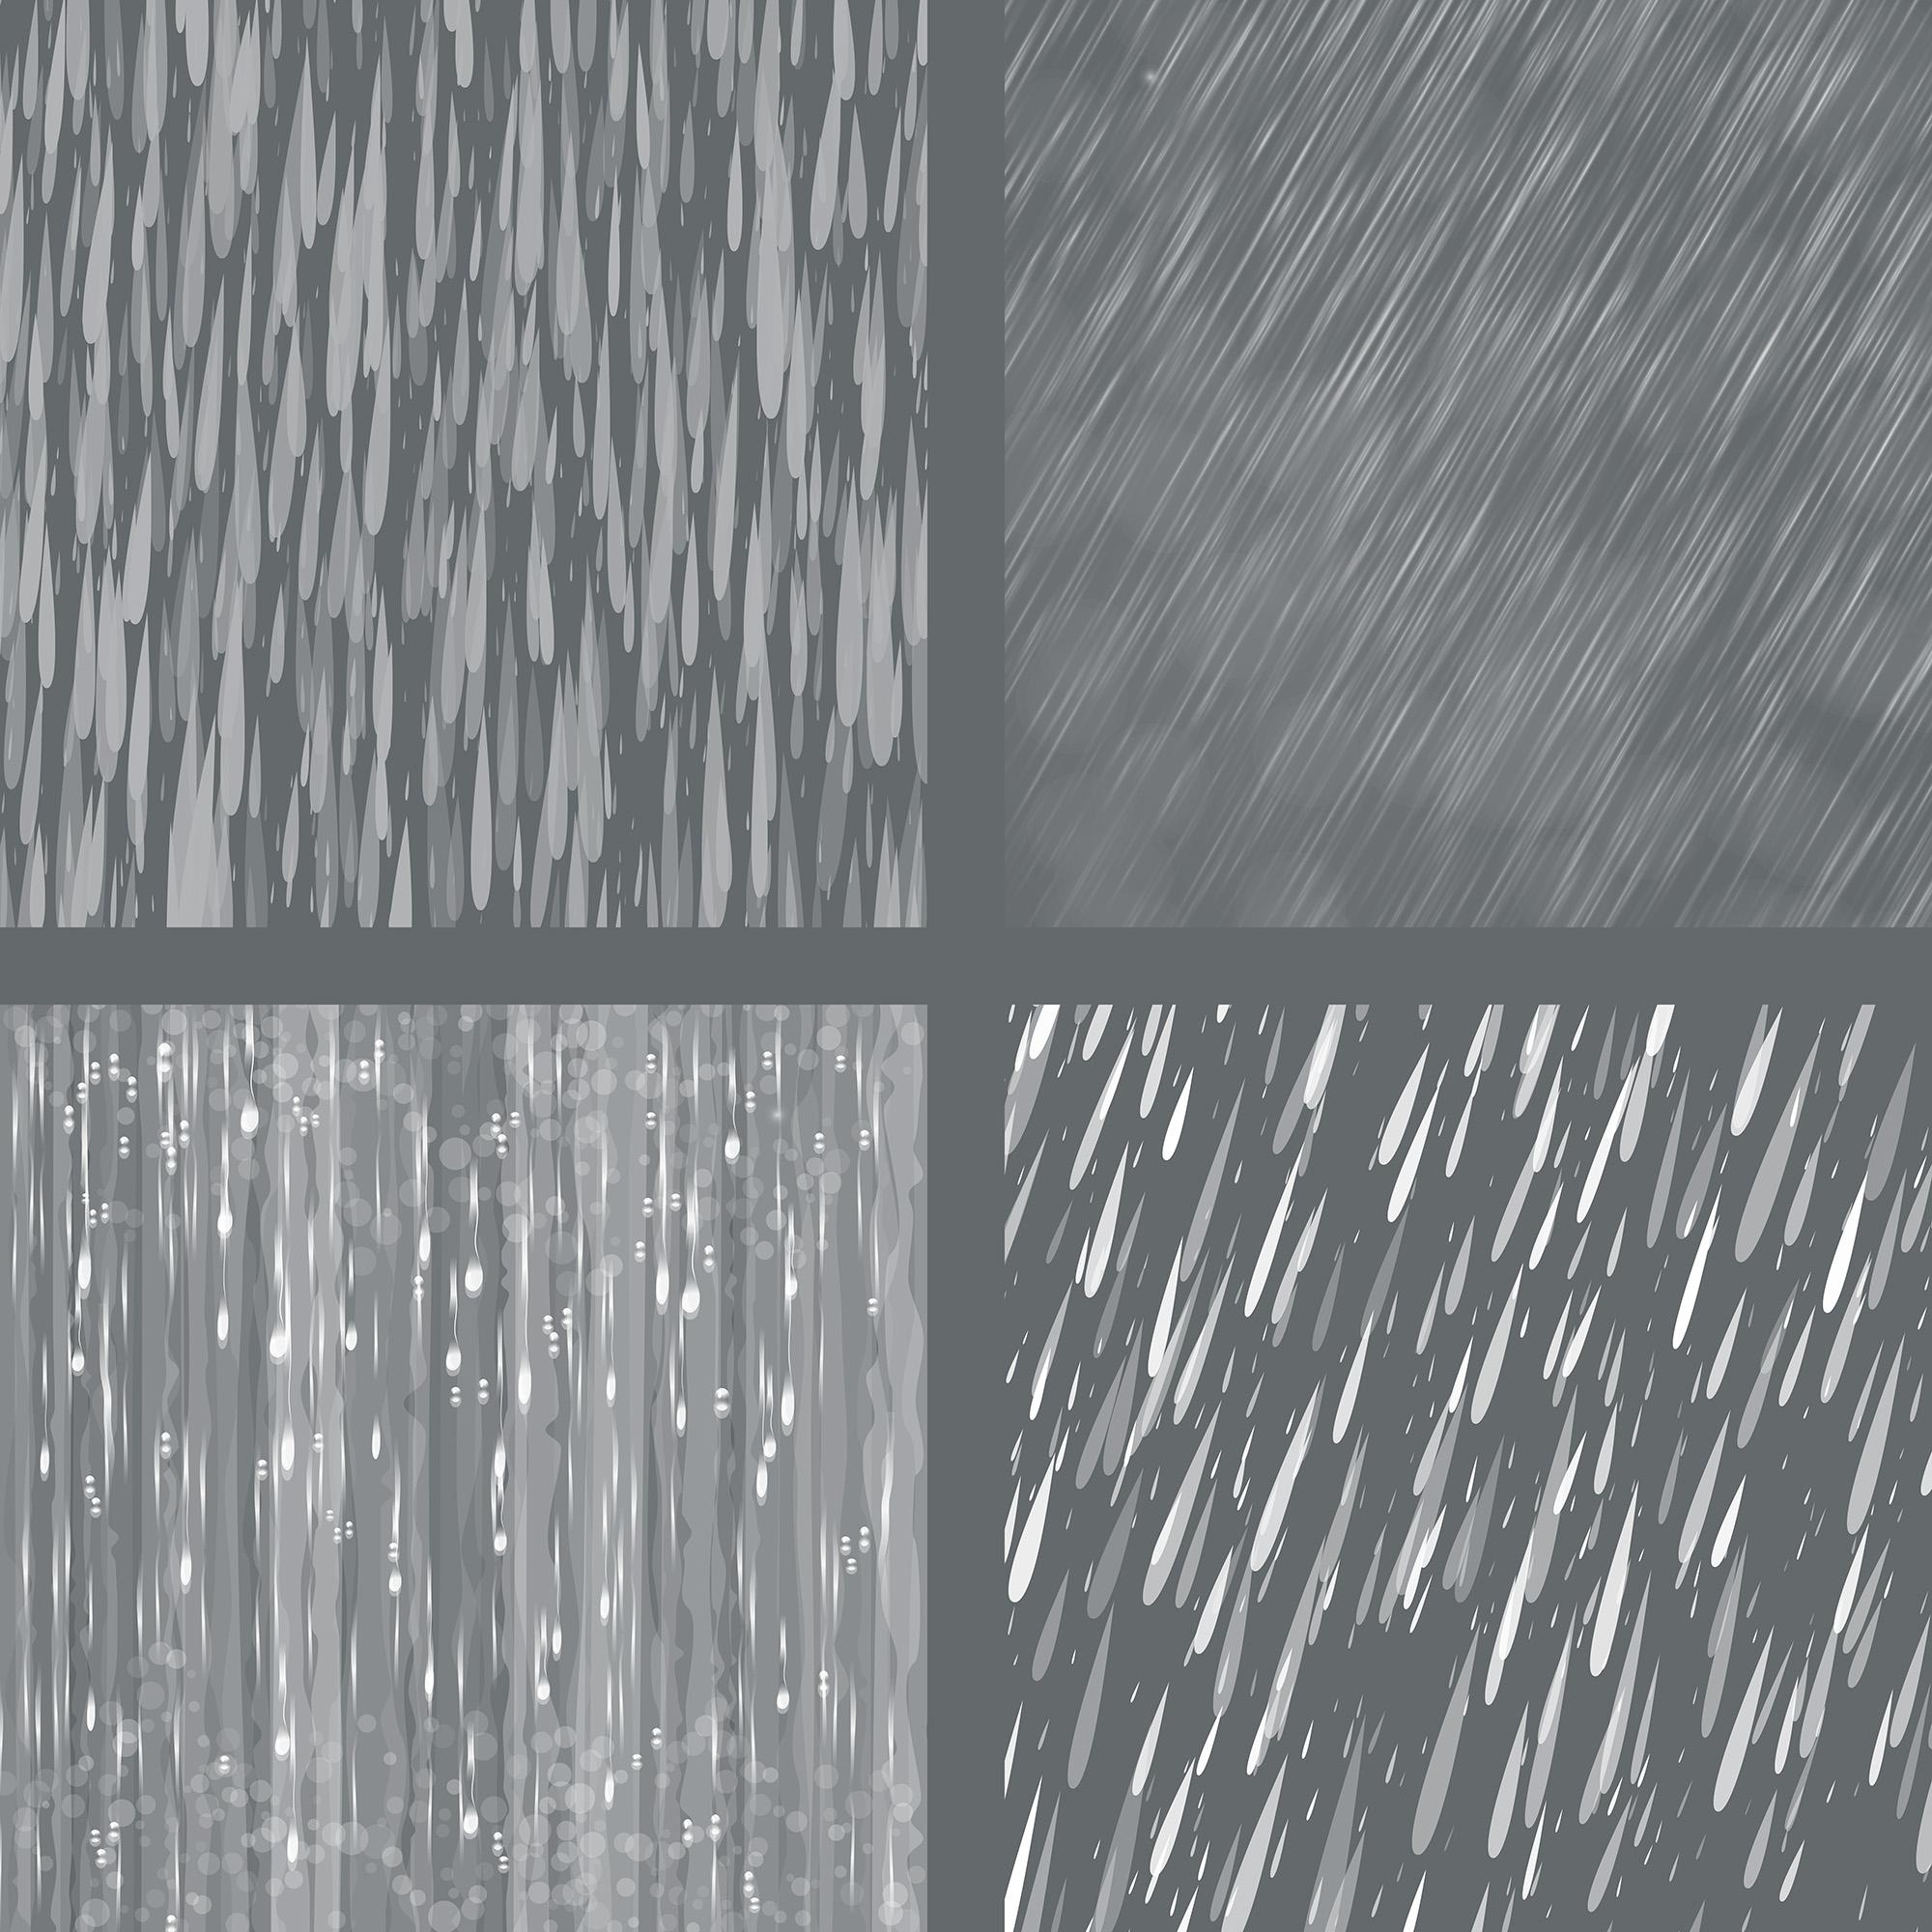 Rain Overlays Clipart, Falling Rain, Photoshop Overlays example image 6